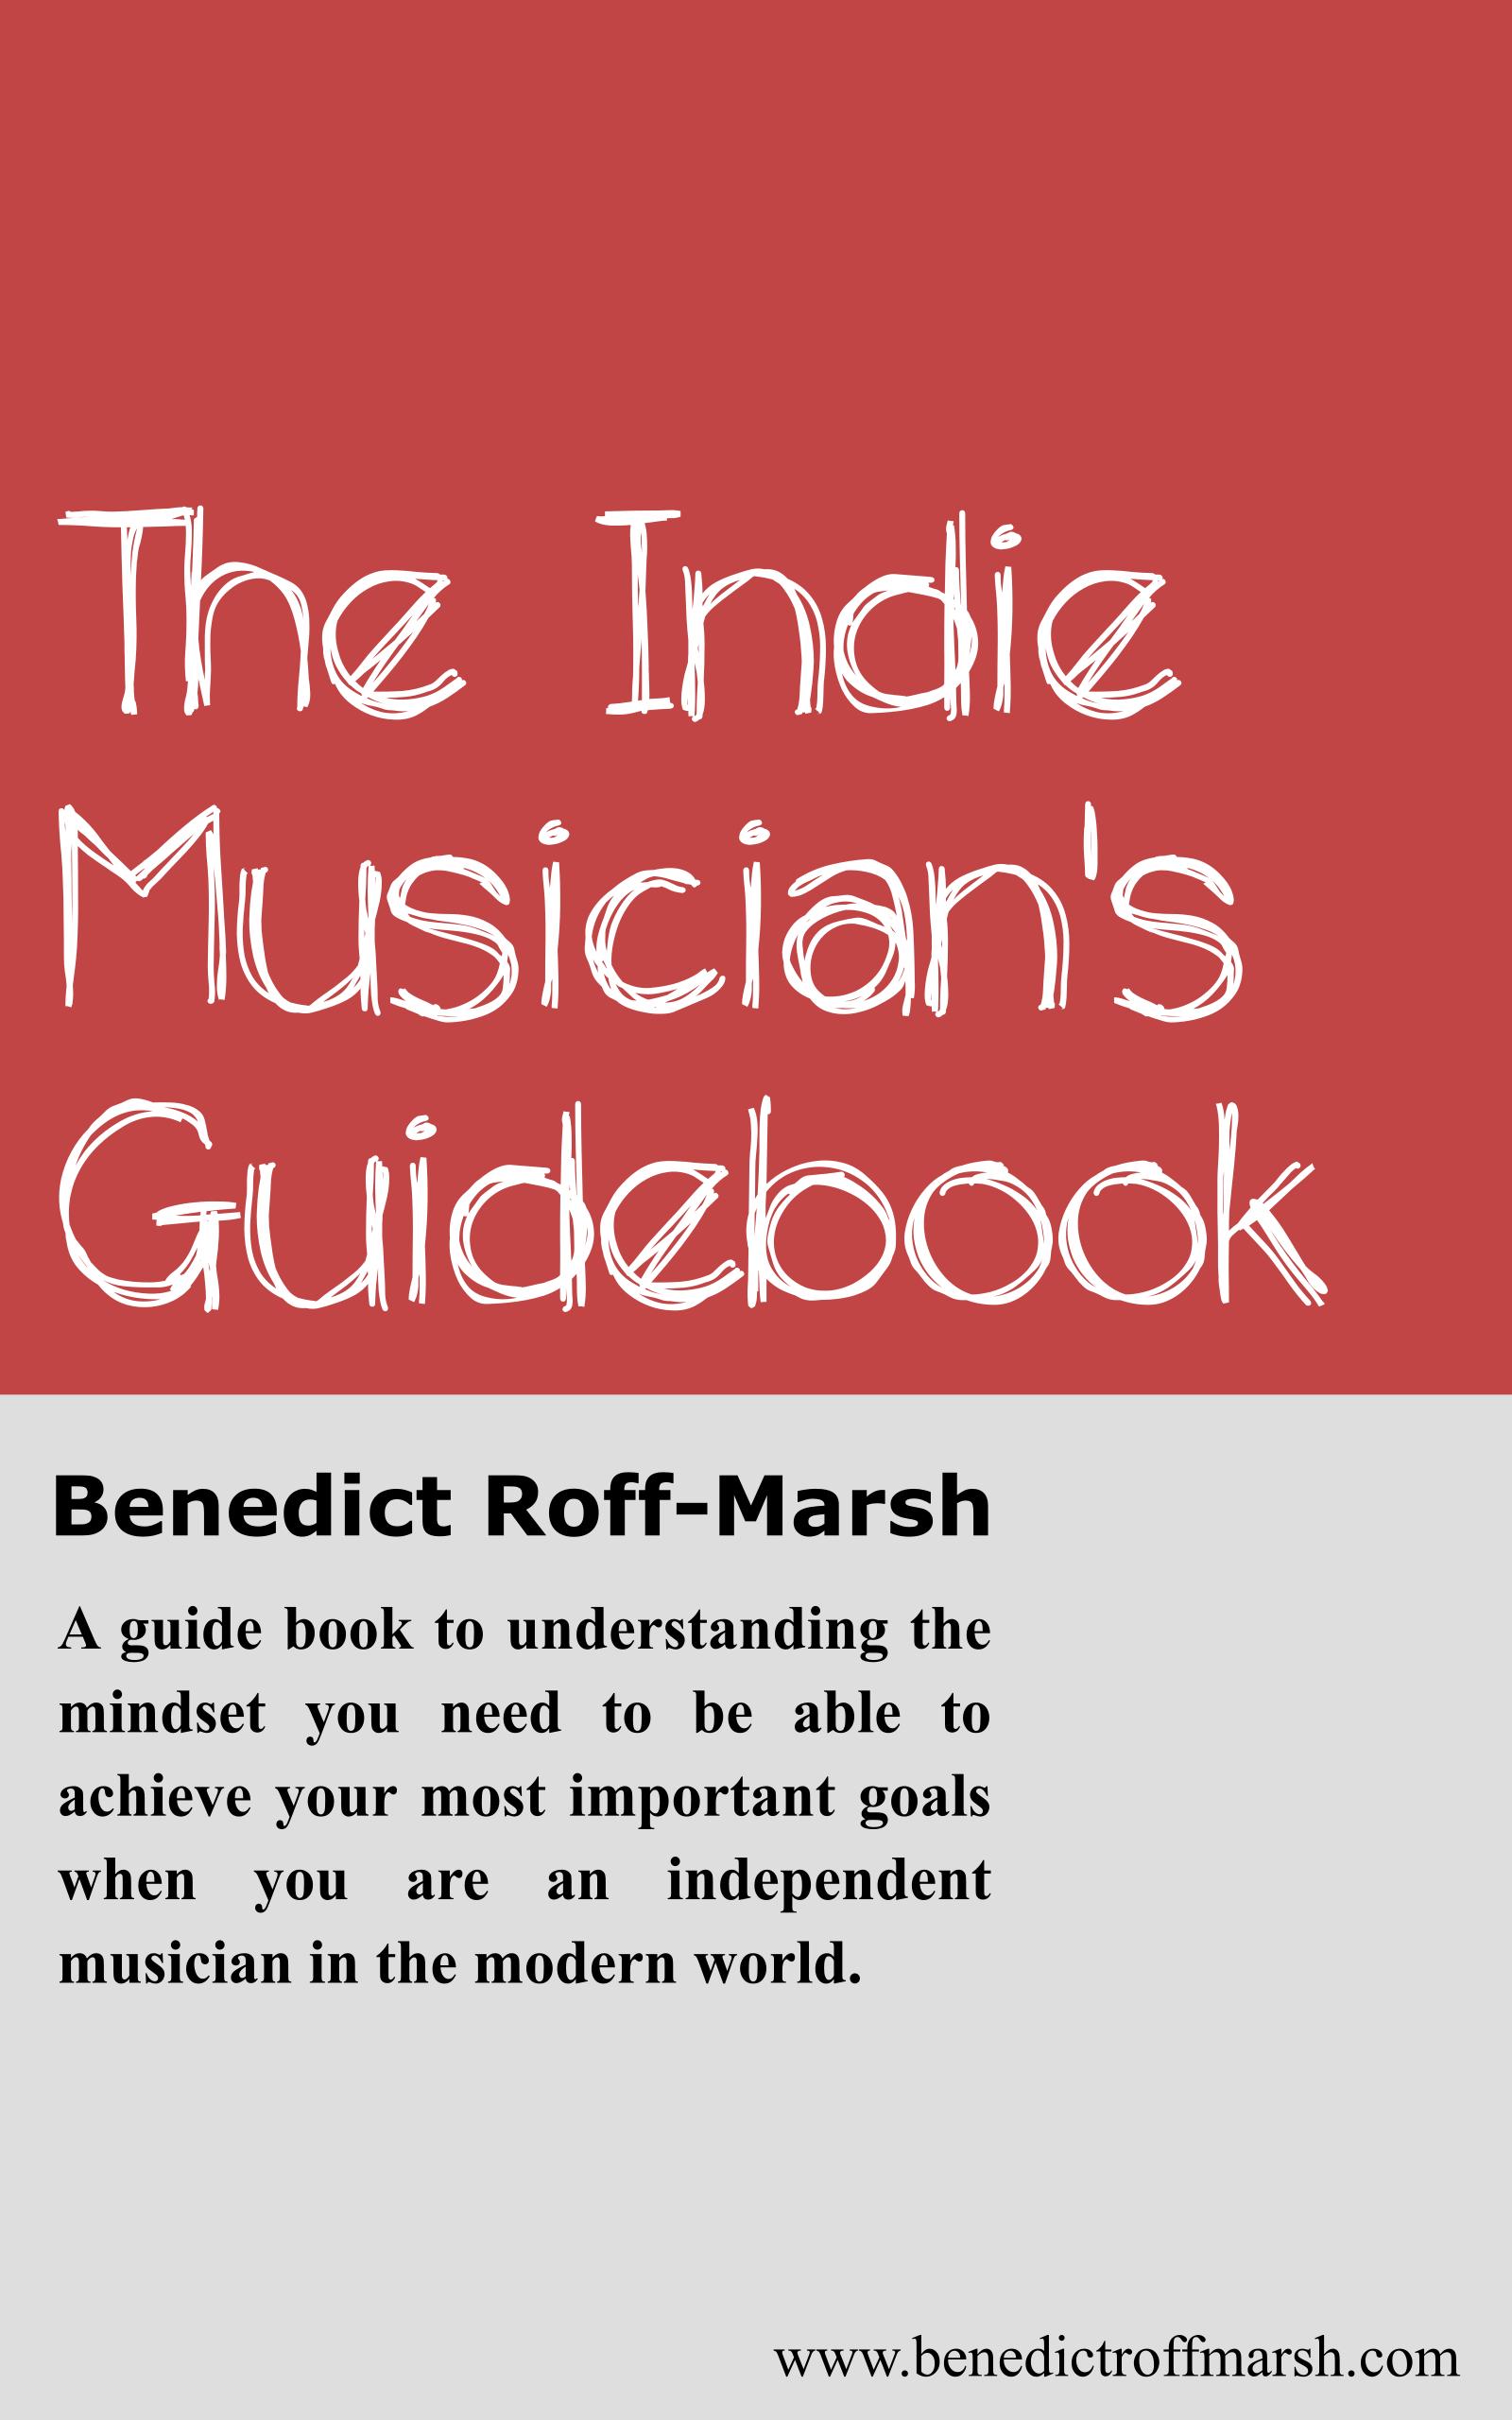 The Indie Musician's Guidebook